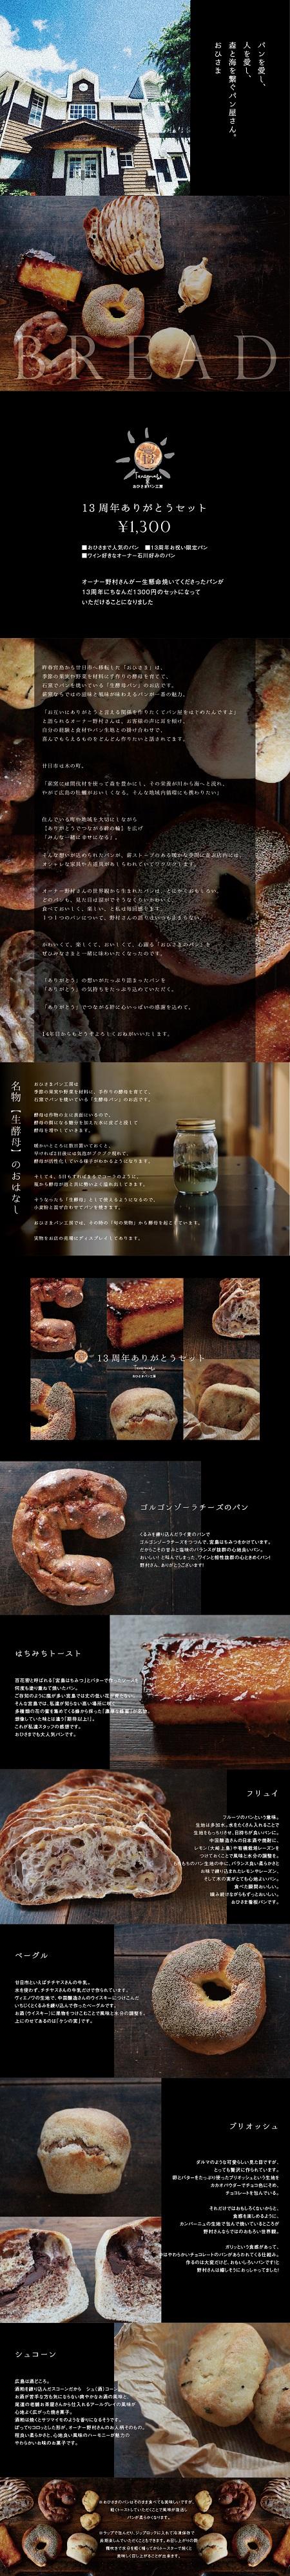 13Anniversary_Bread.jpg